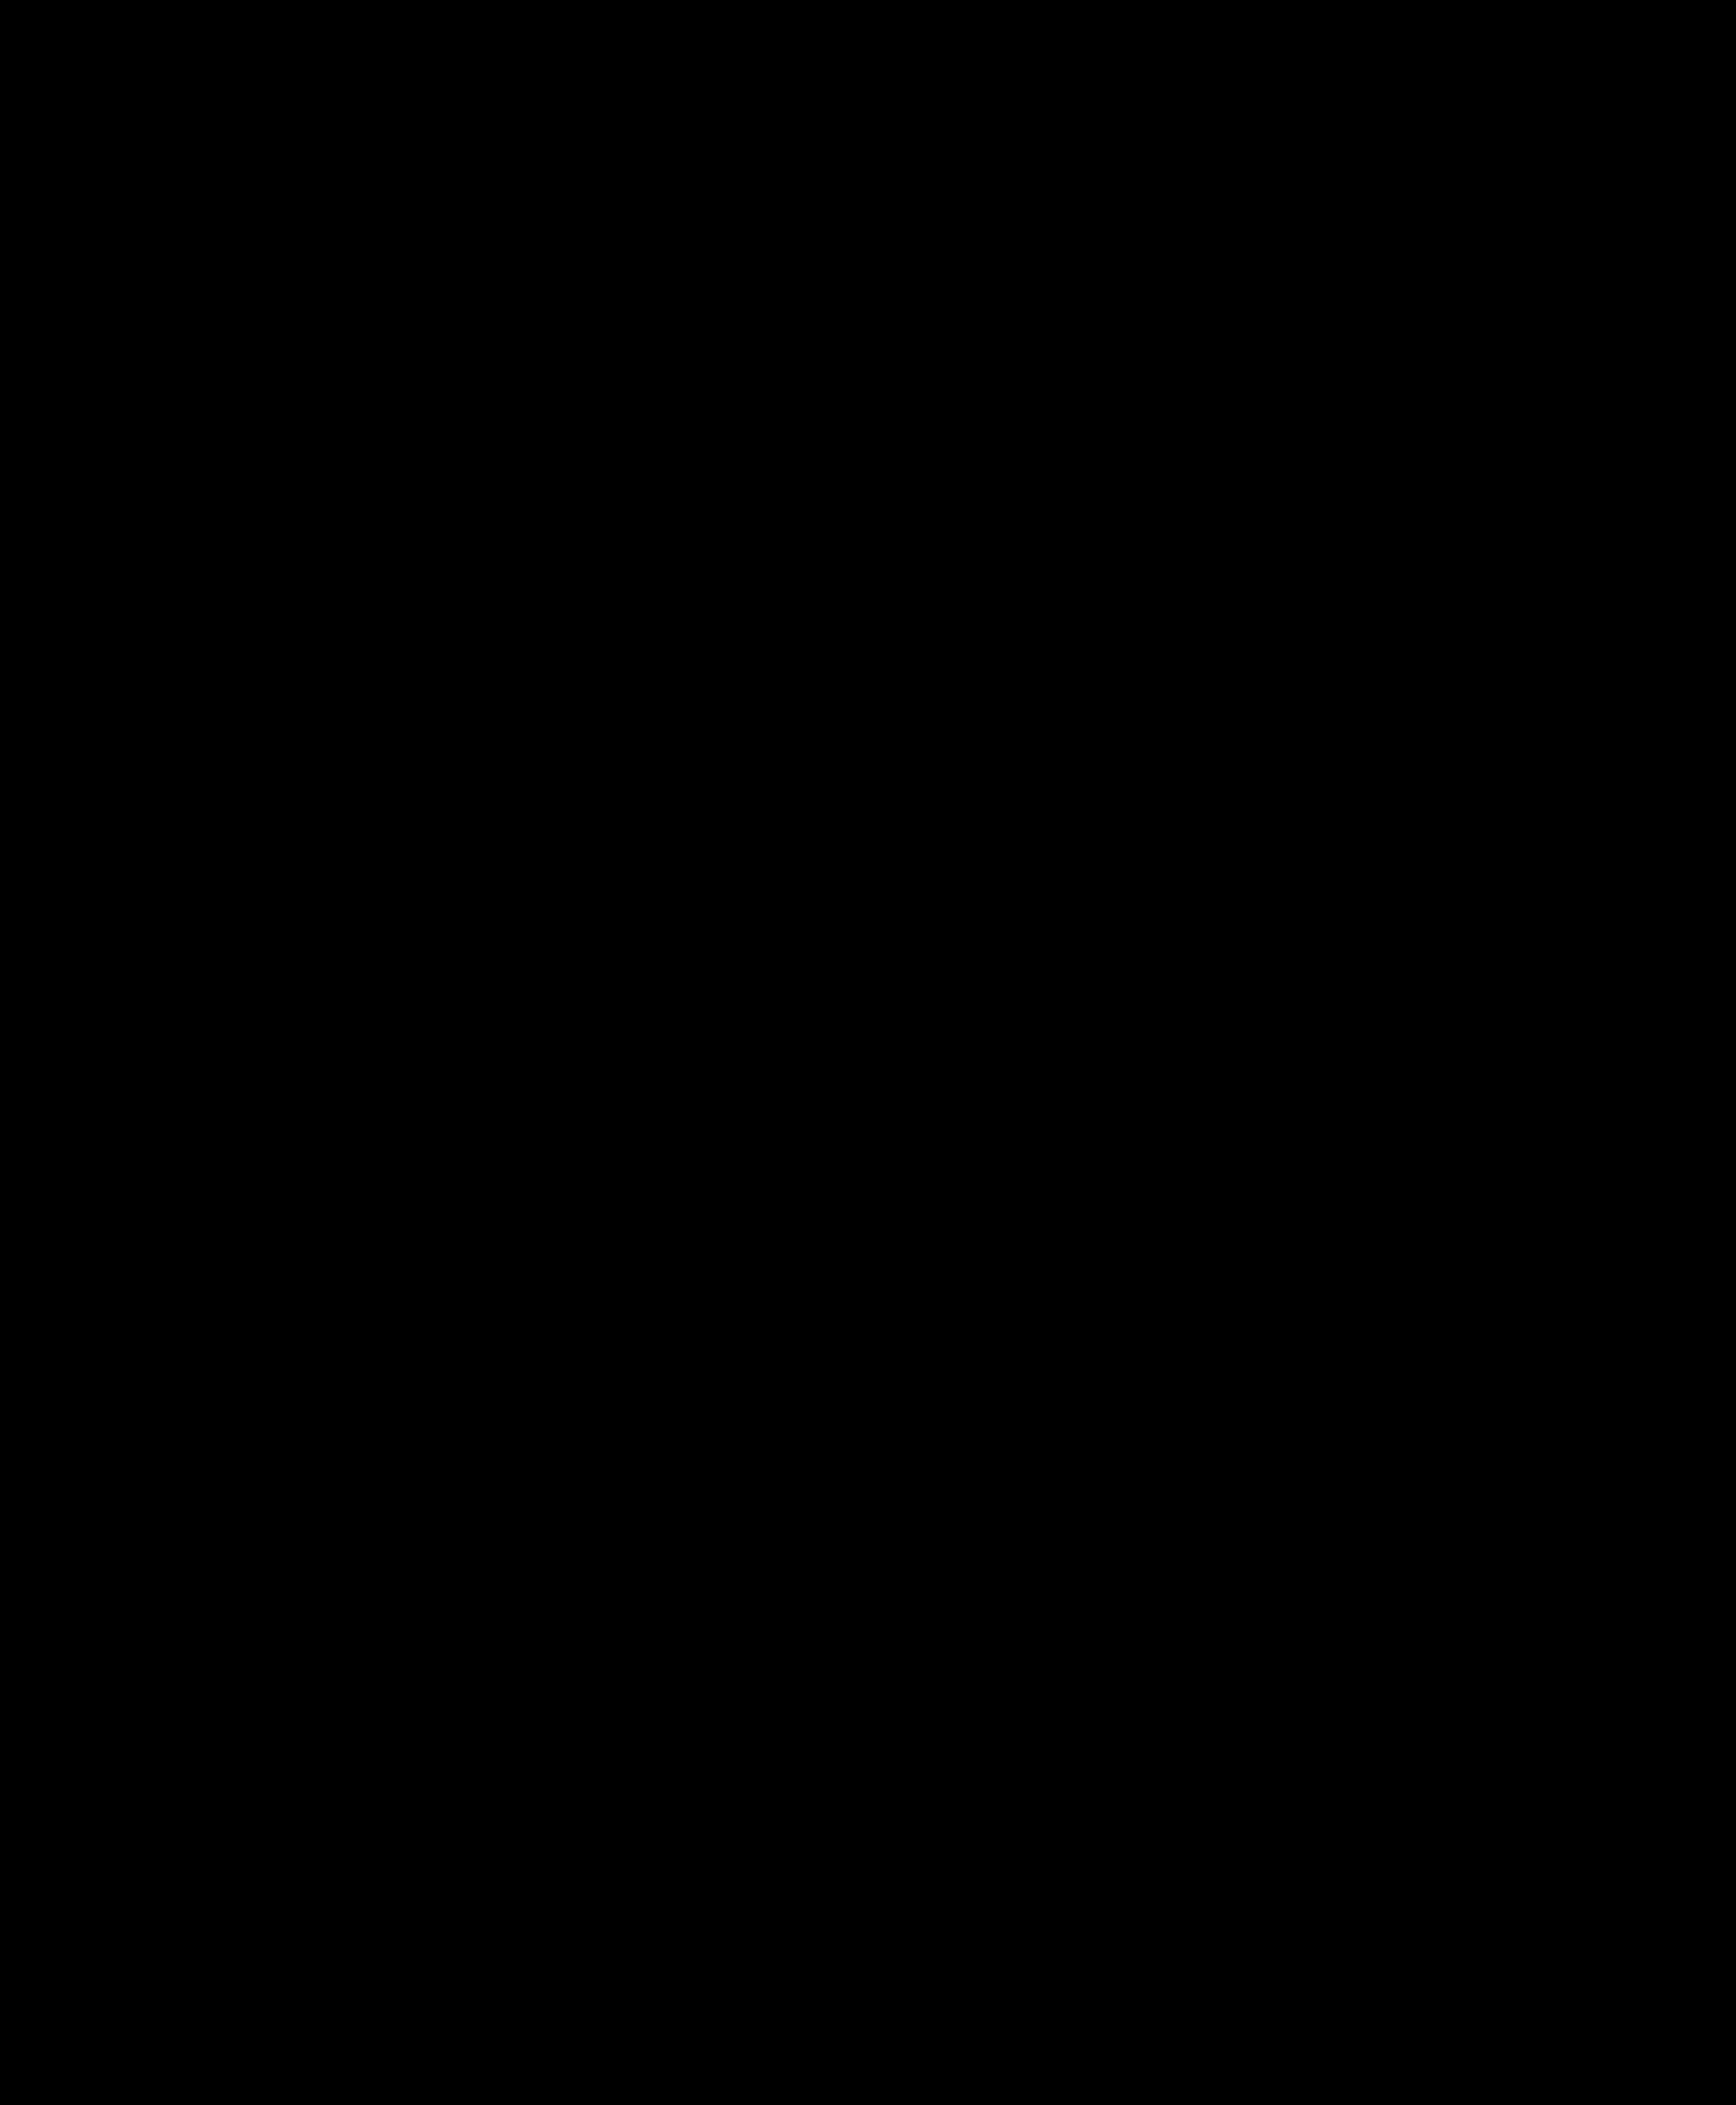 2-Hydroxy Tetrabenazine